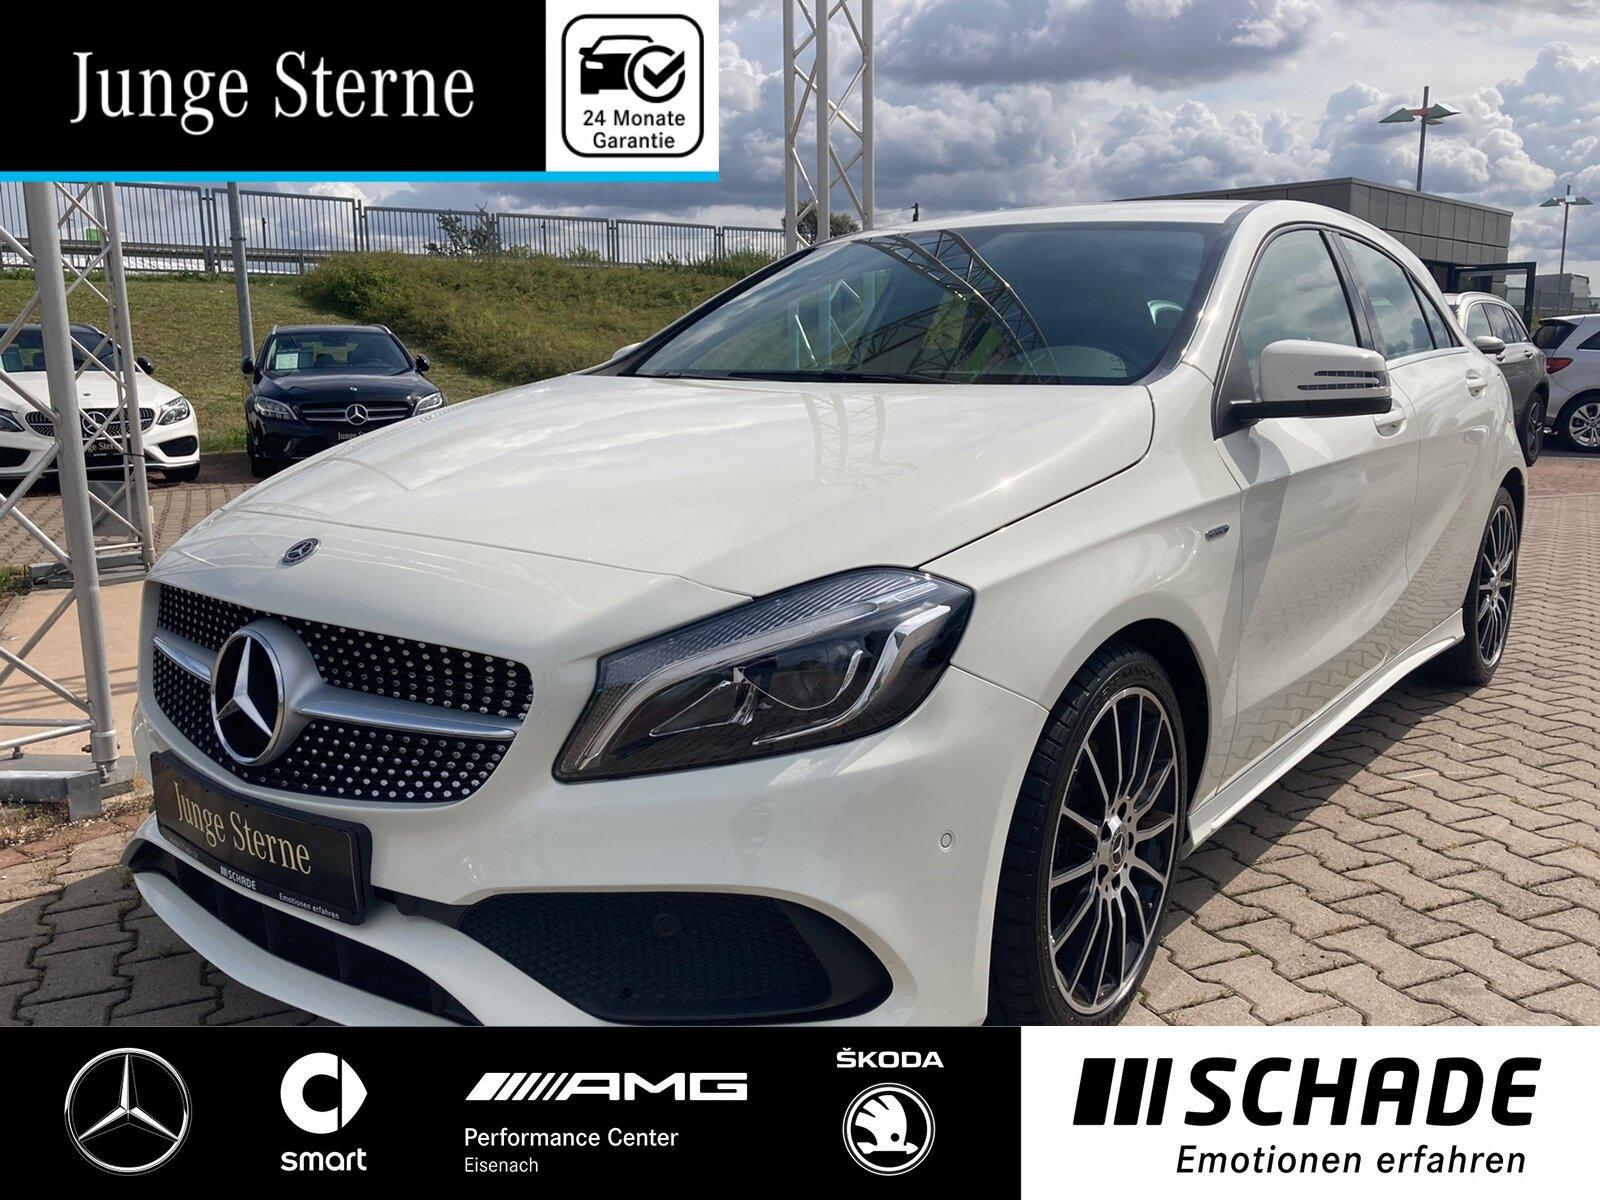 Mercedes-Benz A 220 d PEAK AMG Navi*LED*Totwinkel*Sitzheizung, Jahr 2017, Diesel